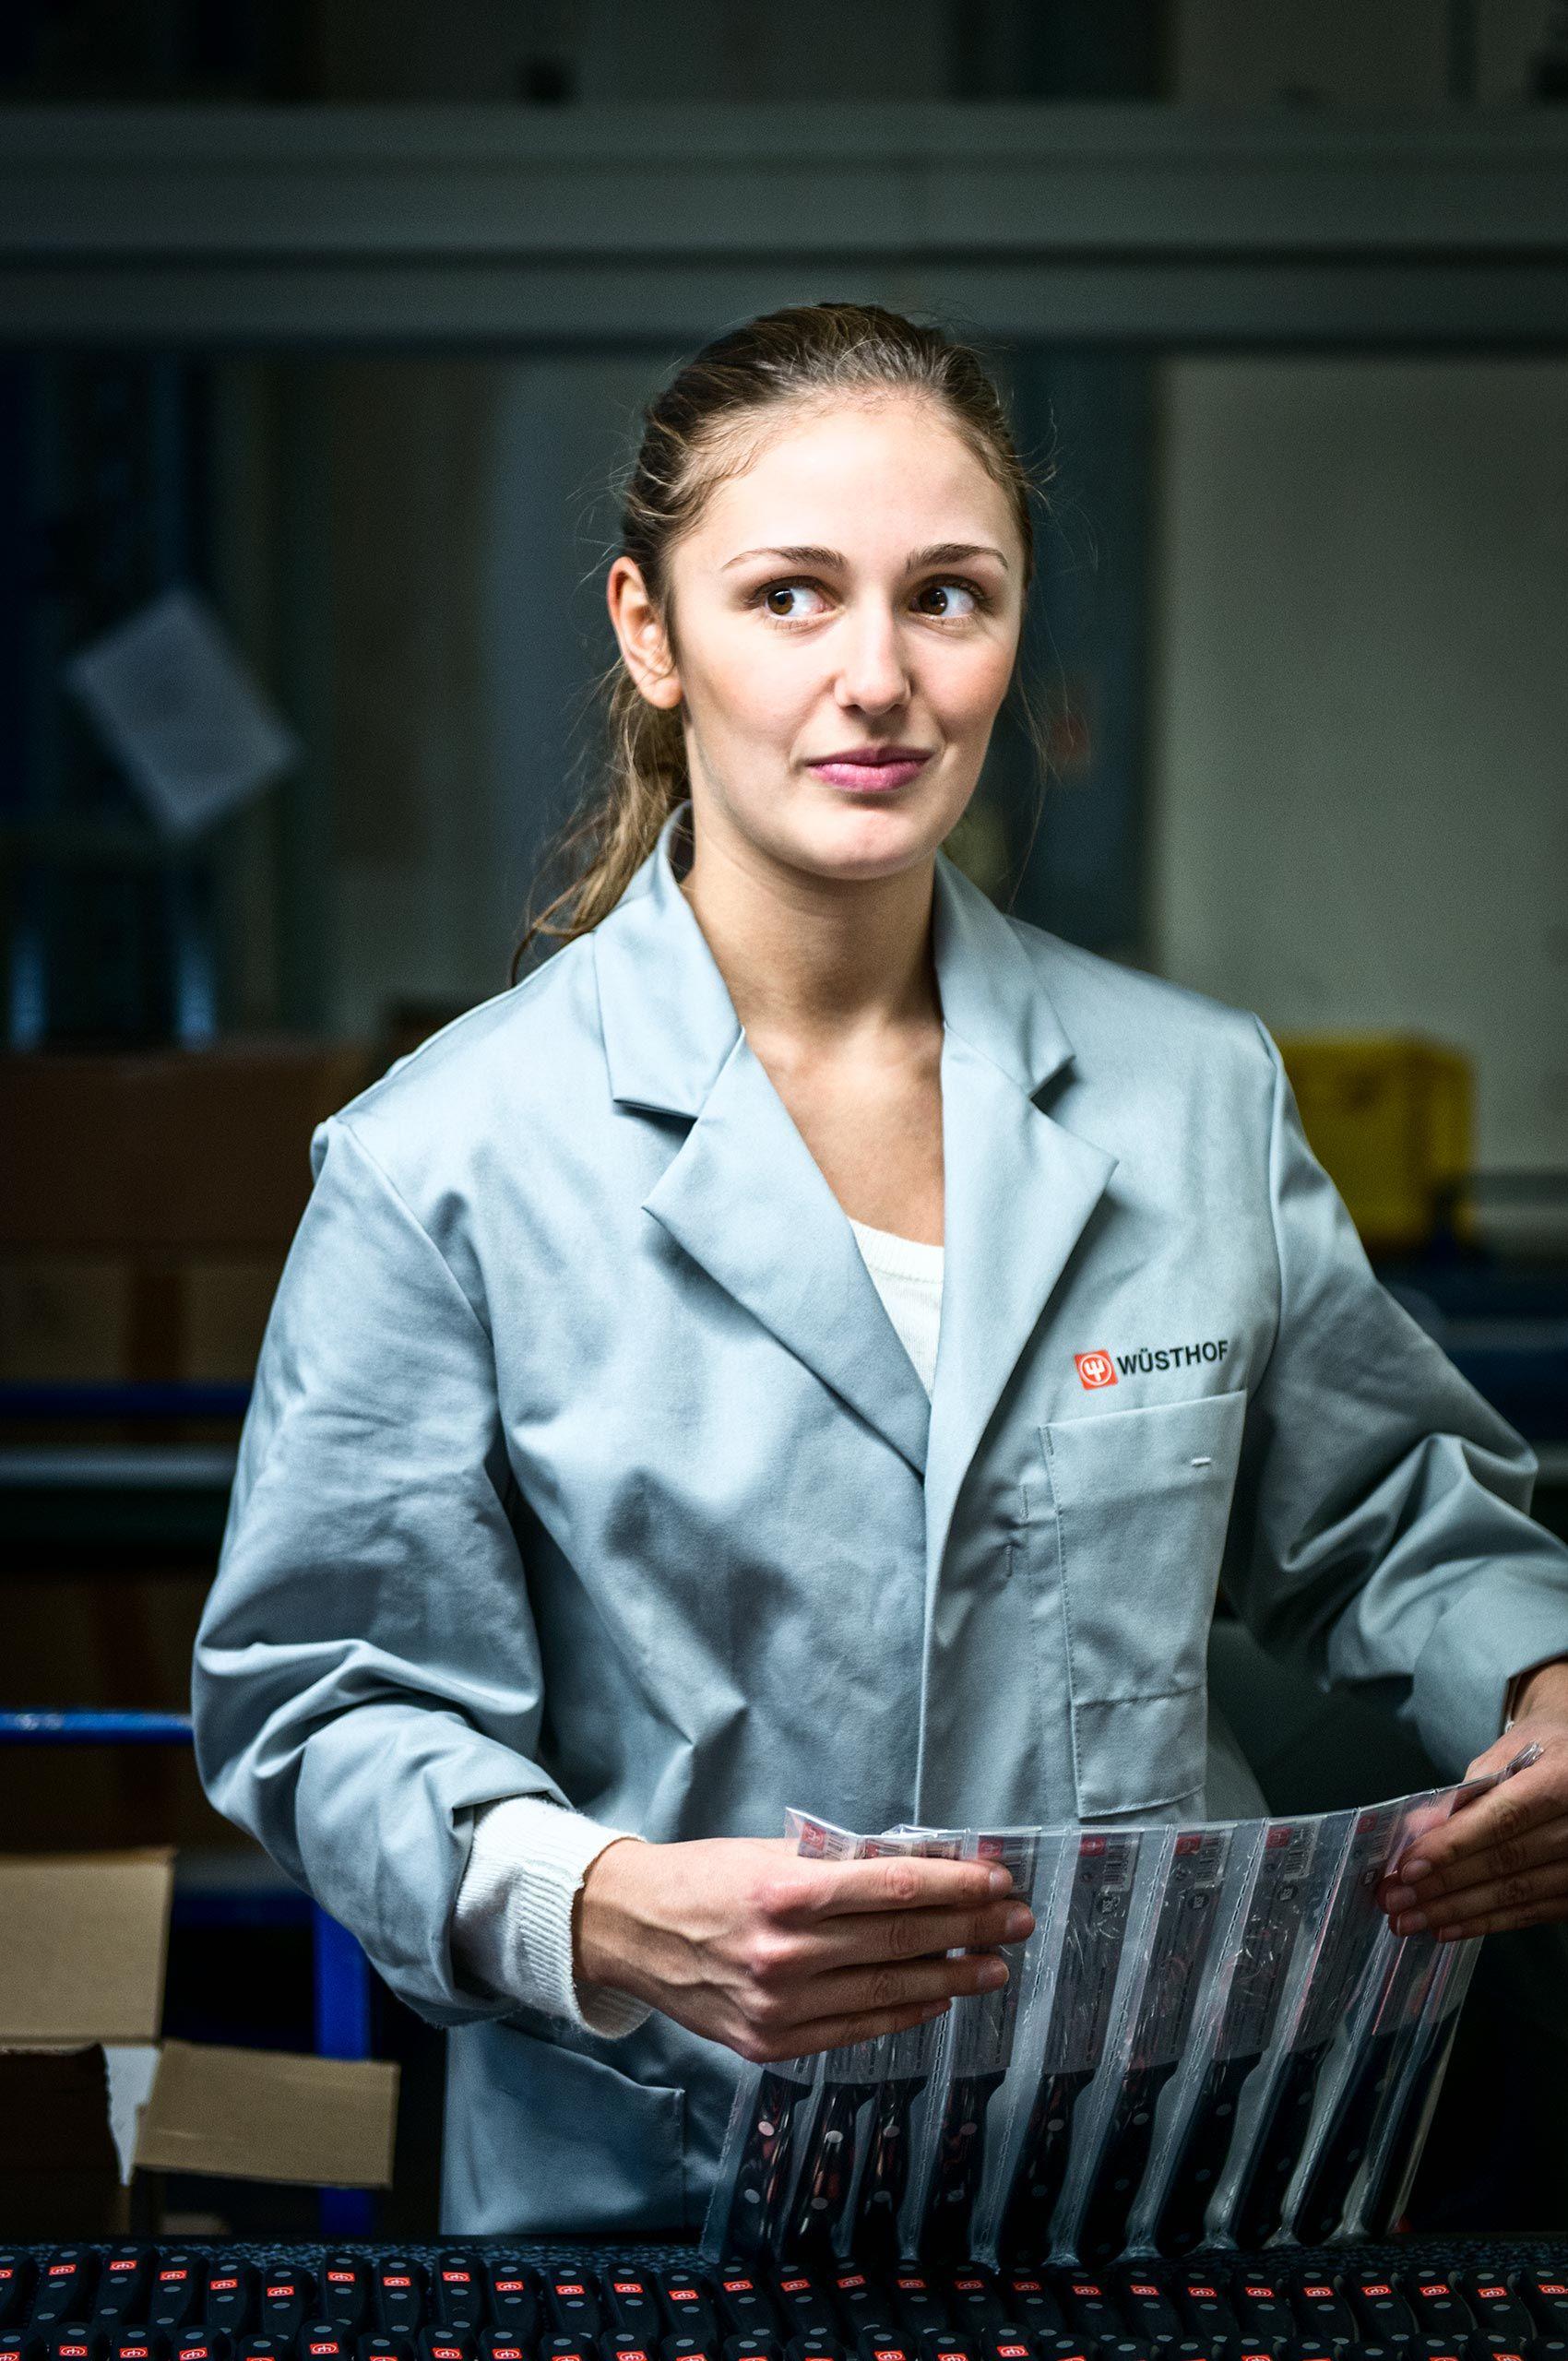 factory-girl-wusthof-HenrikOlundPhotography.jpg